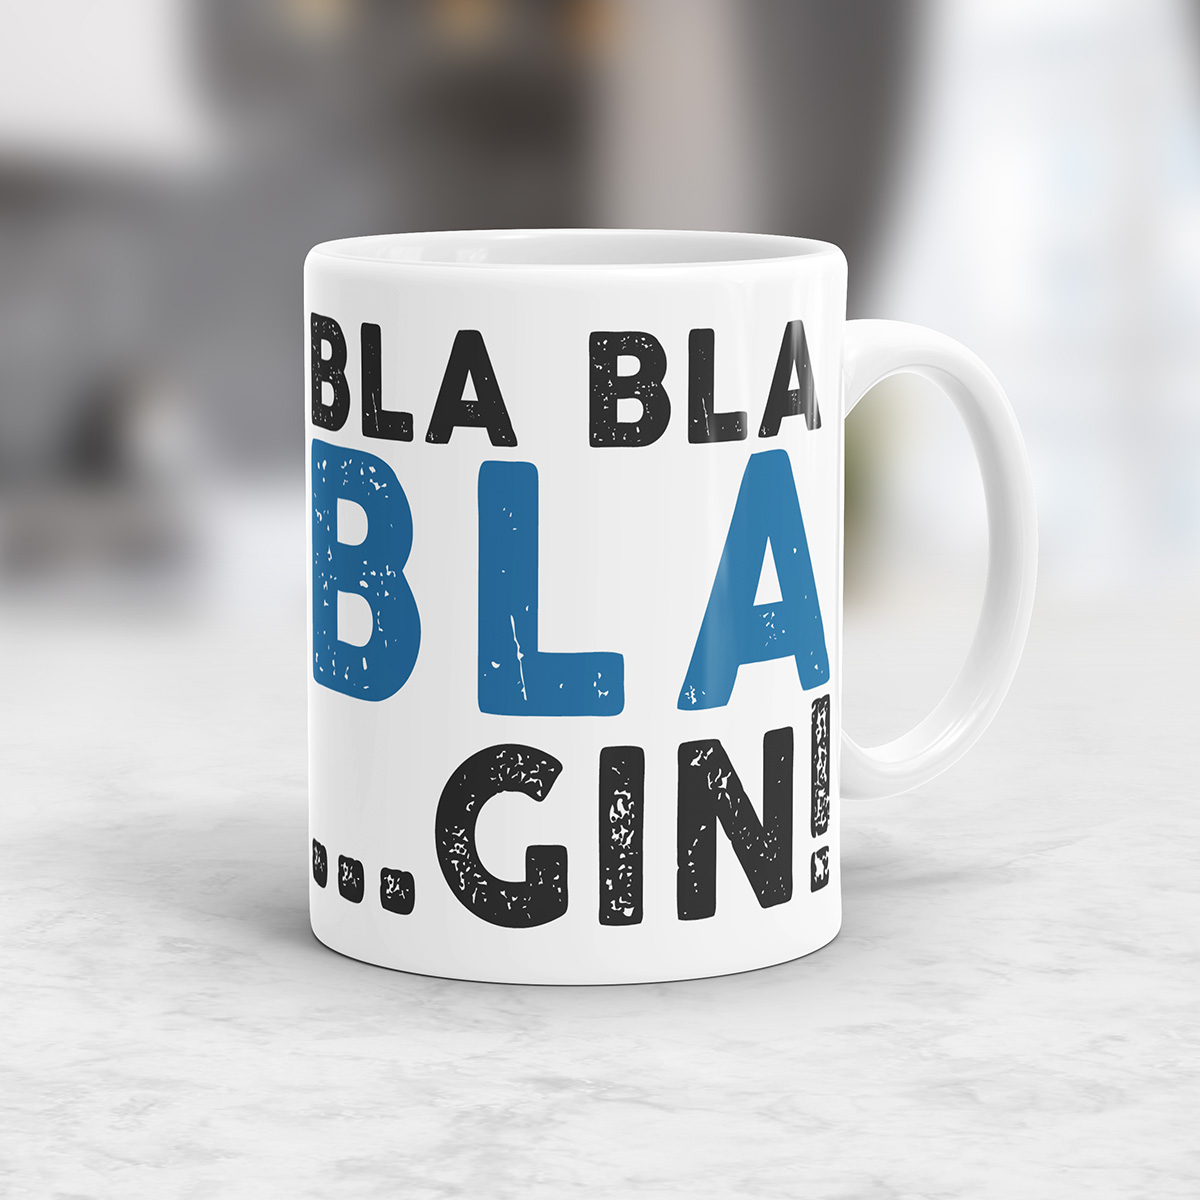 Personaliseerbare Bla Bla Mok